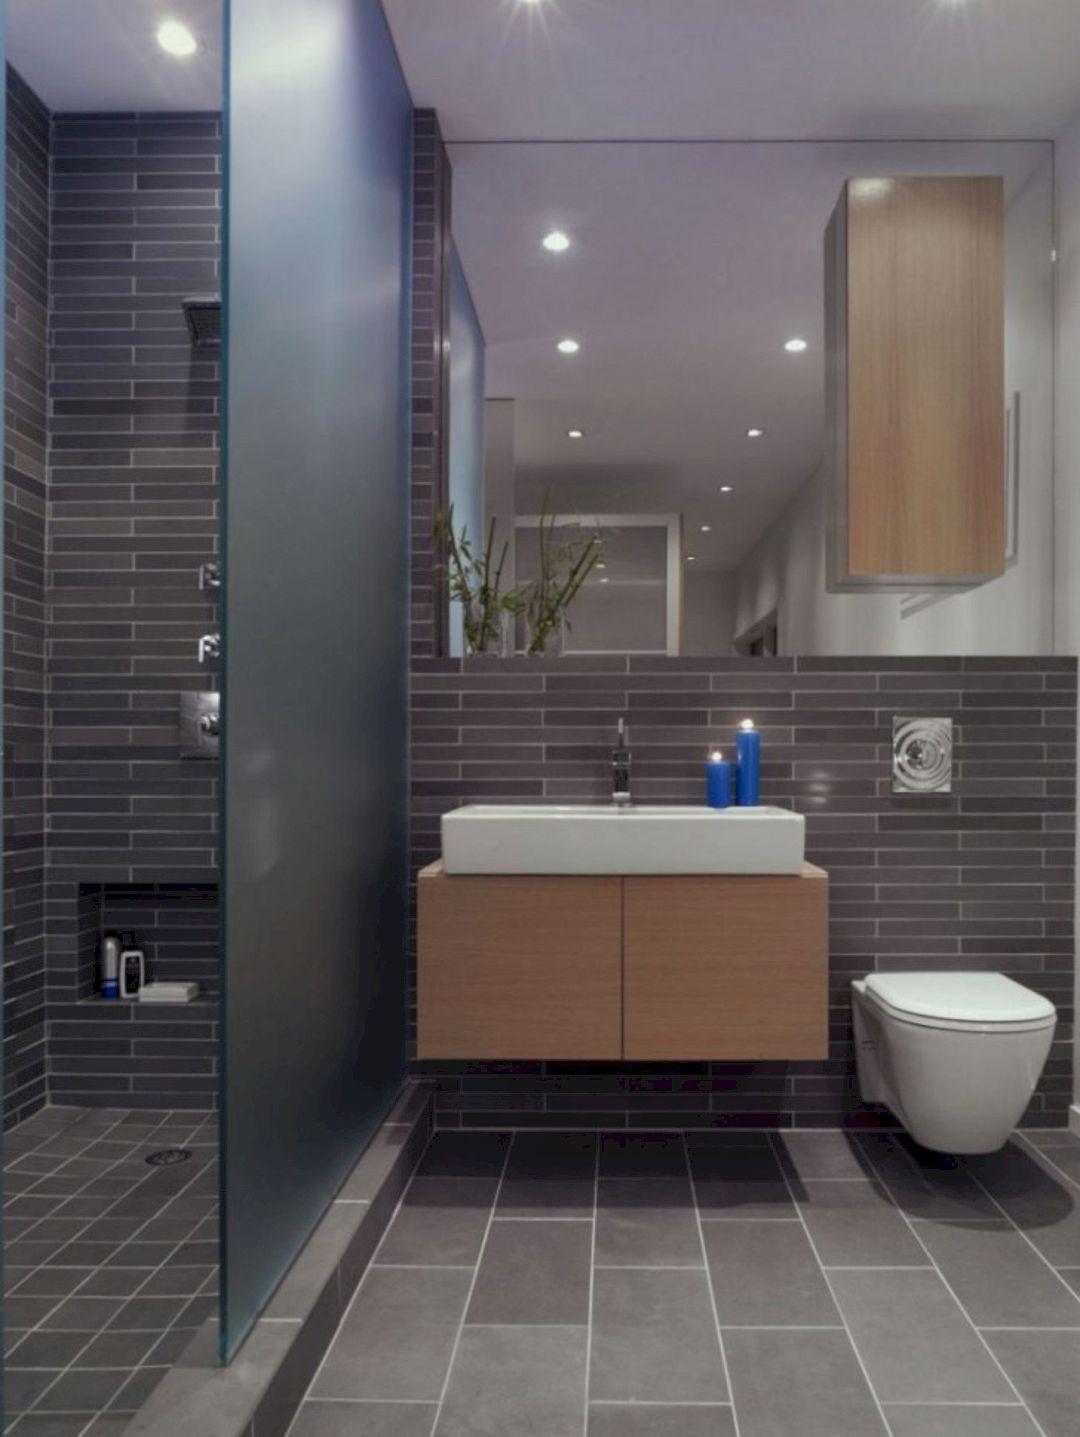 16 Small Bathroom Renovation Ideas Bathroom Design Small Modern Modern Small Bathrooms Bathroom Design Small